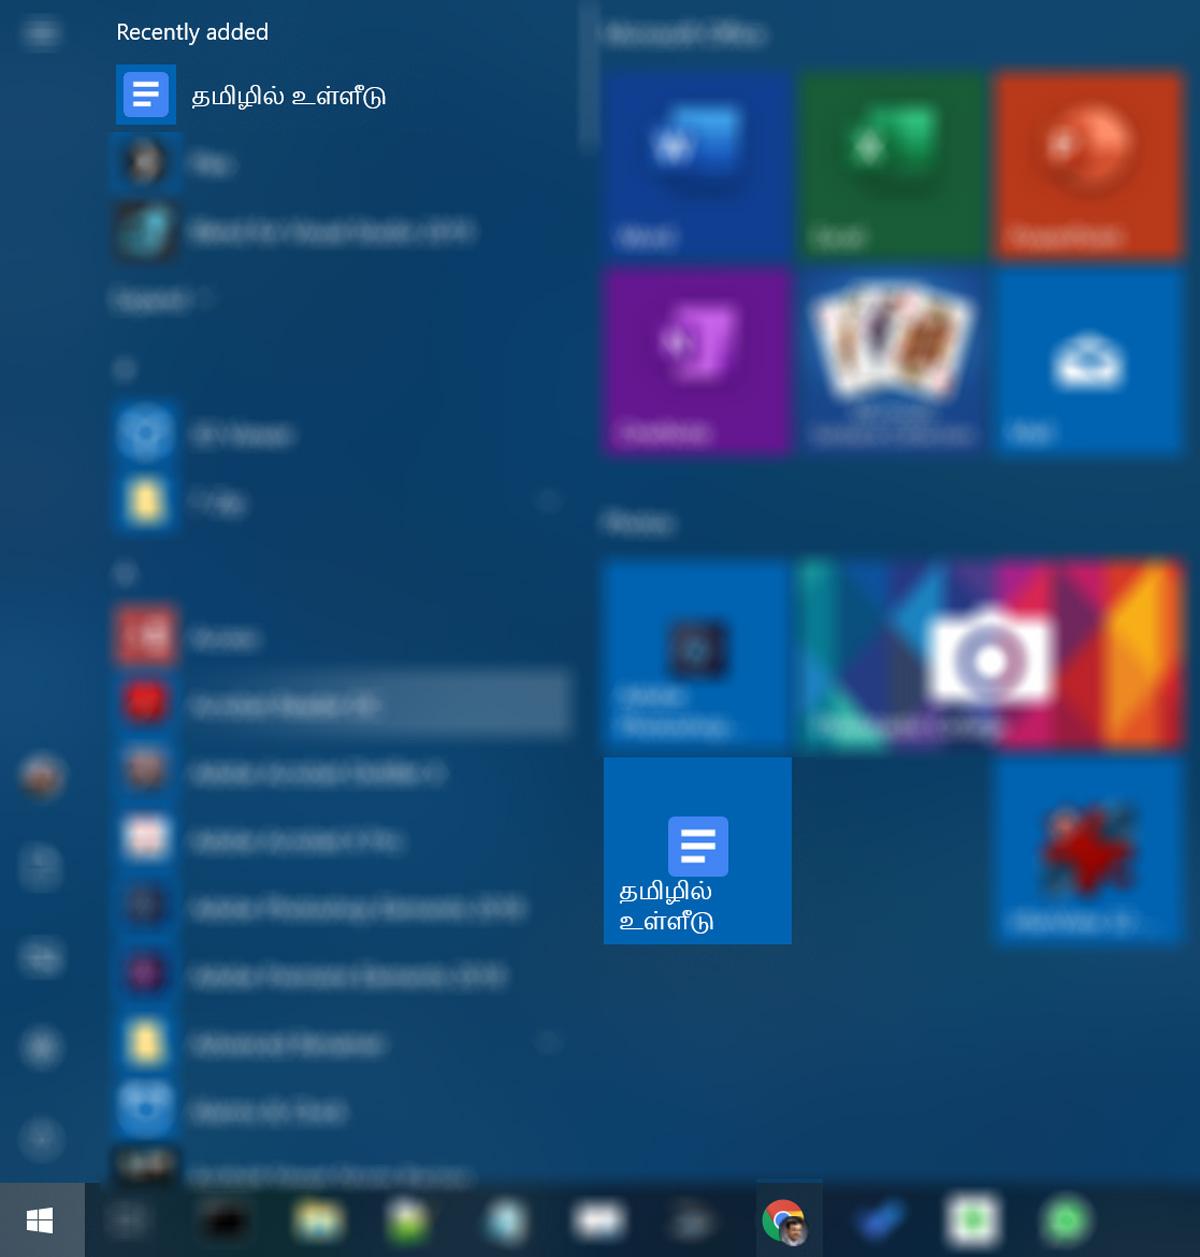 Pin the shortcut to Windows Start Menu from the Recently added list - தமிழில் உள்ளீடு என்பது Google Docs கோப்புக்கு நான் வைத்த பெயர்